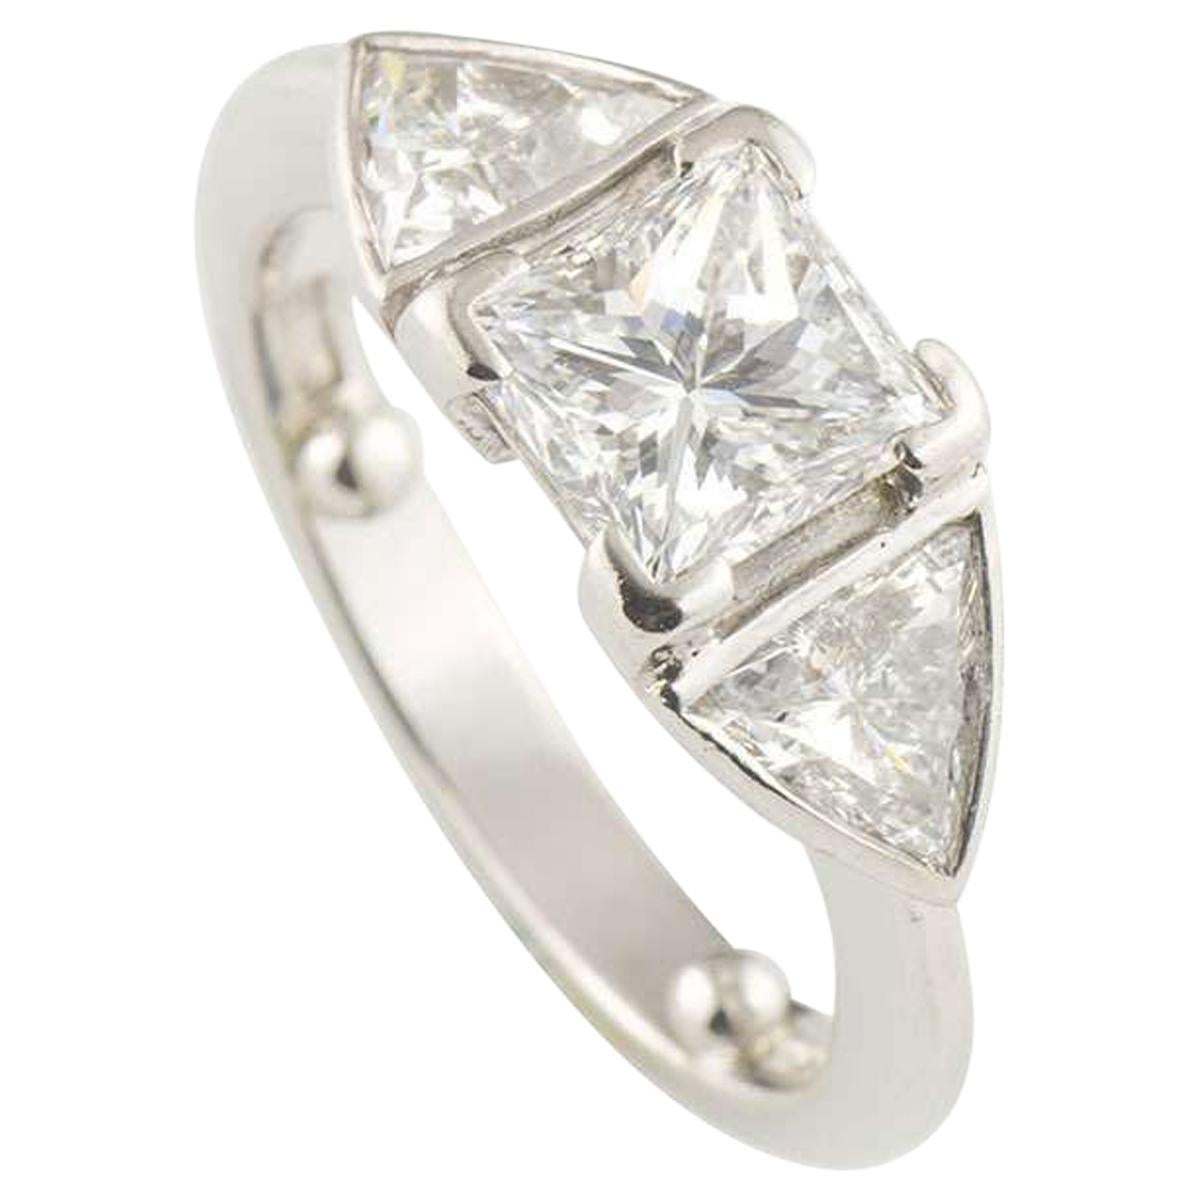 GIA Certified Princess Cut Diamond Ring 1.07 Carat D/VS2